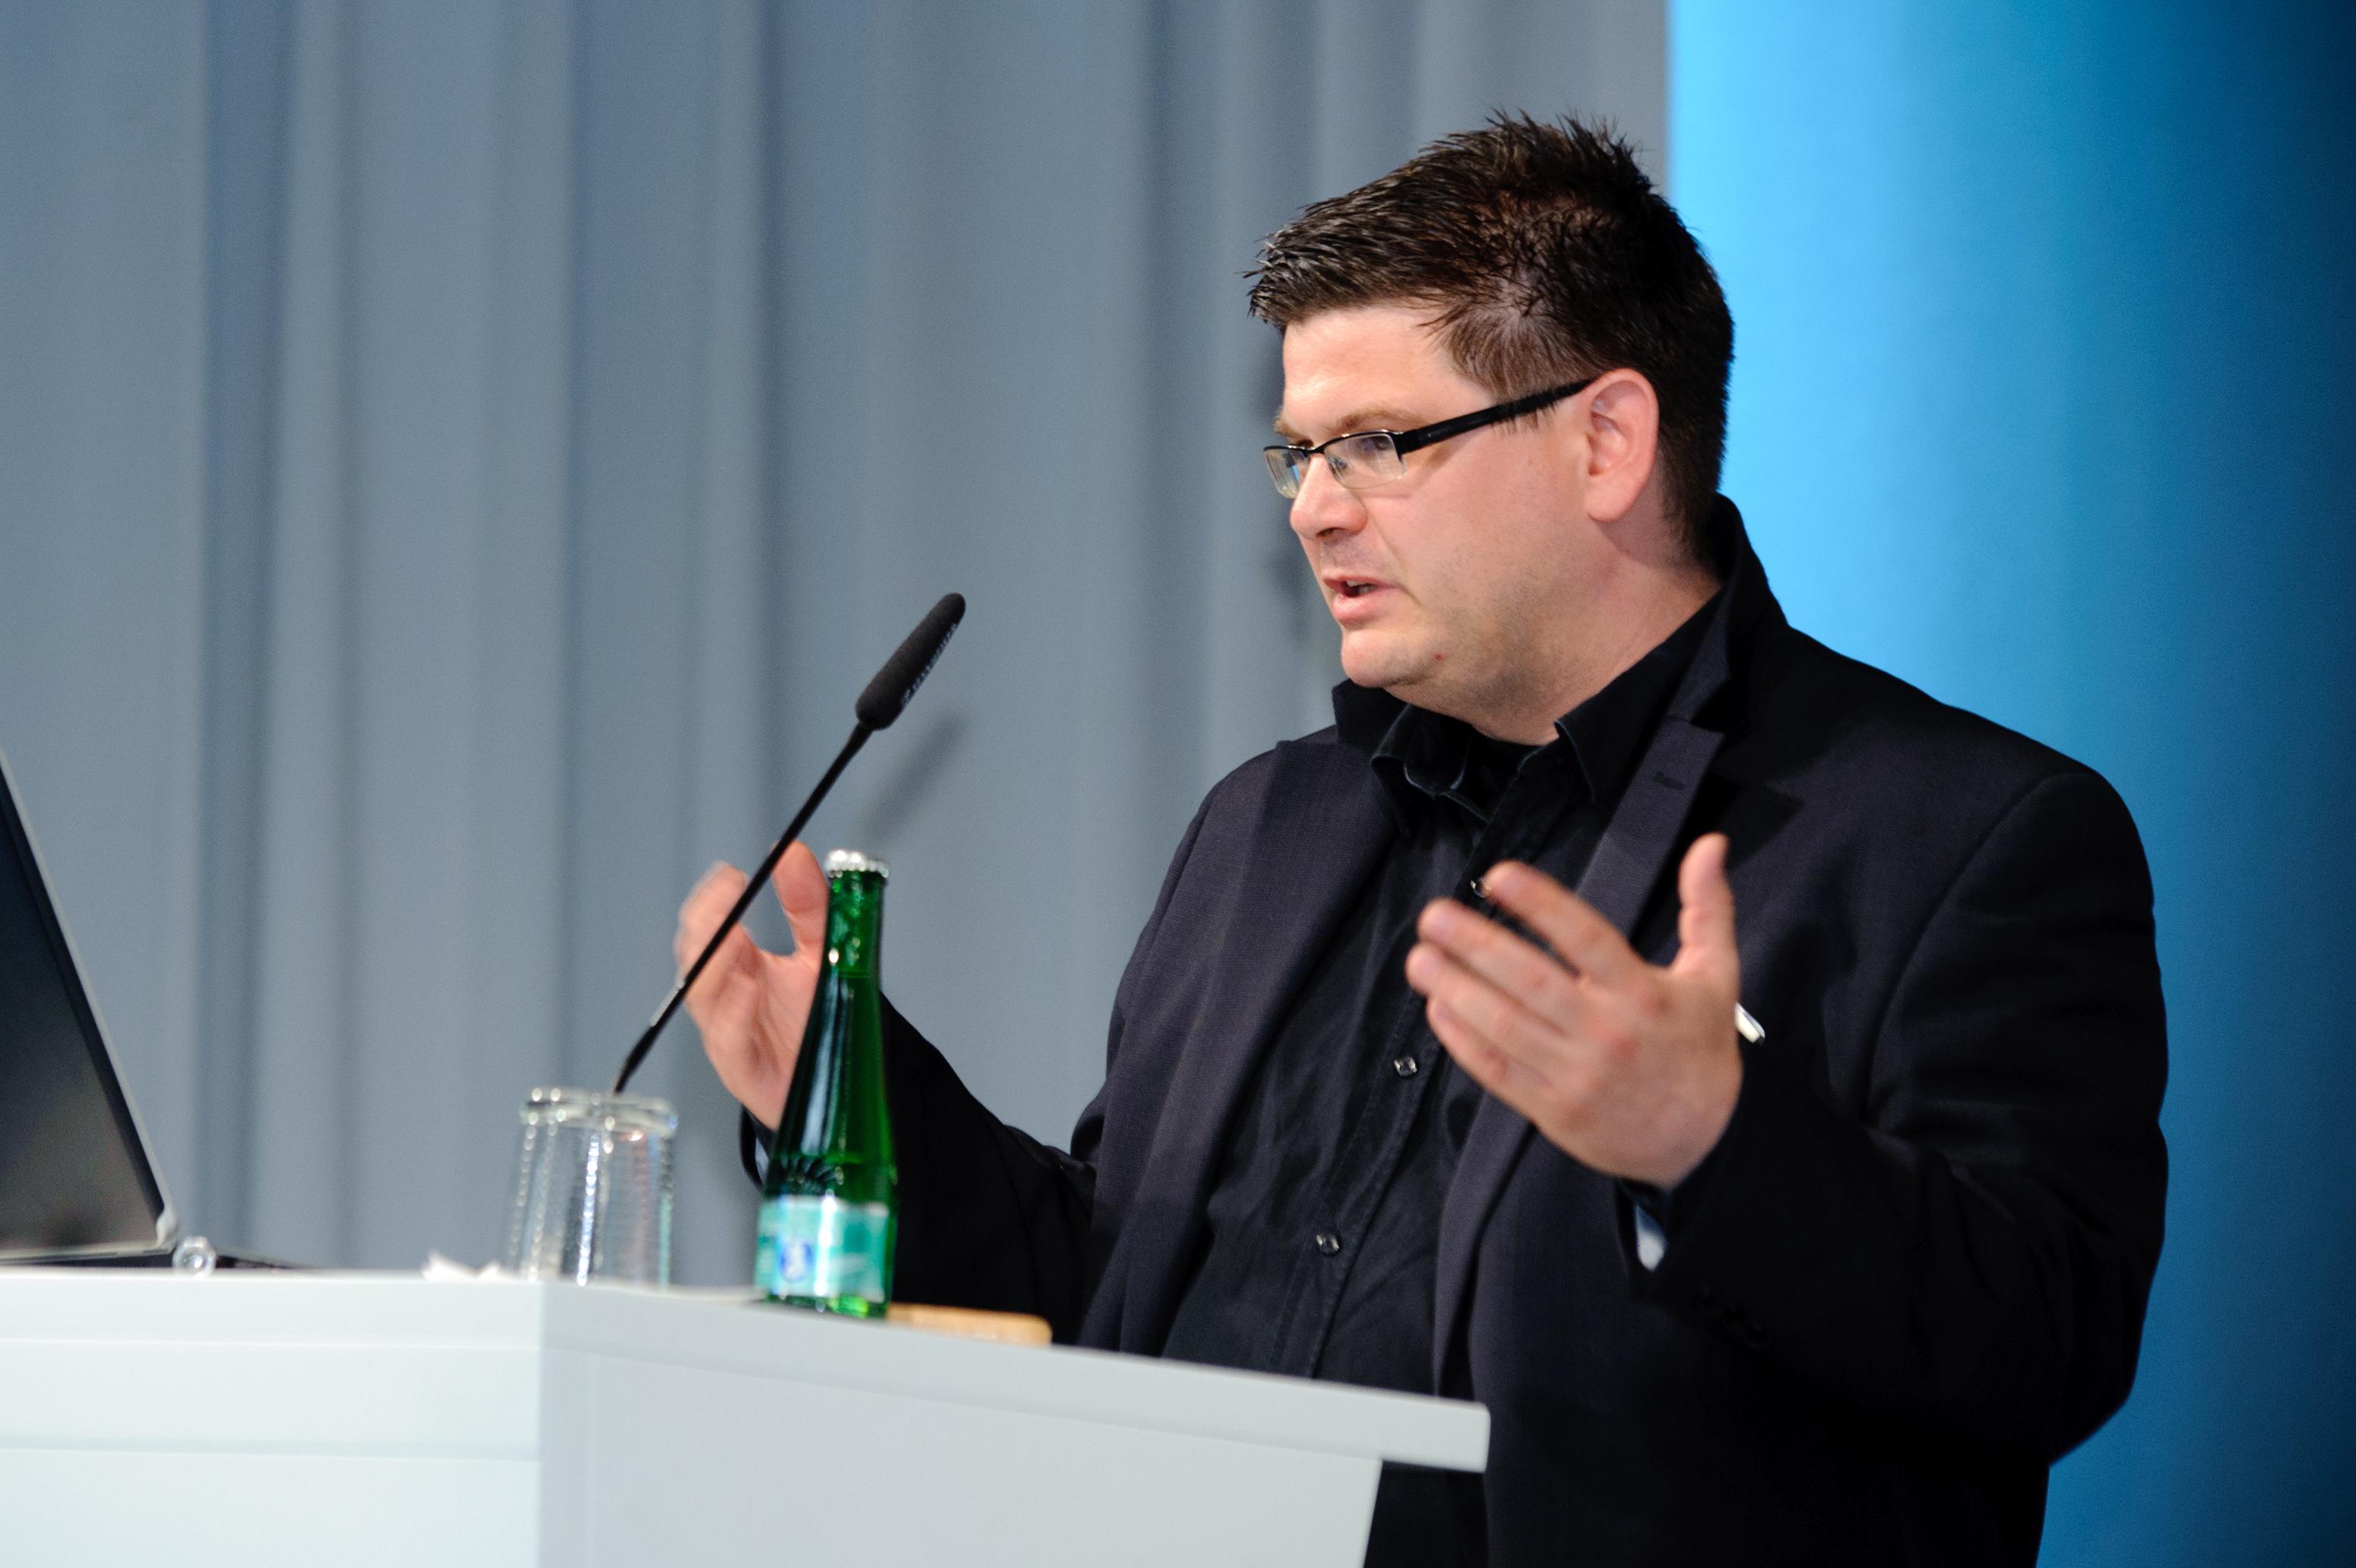 Andrej Holm. Foto: Heinrich-Böll-Stiftung - Flickr, CC BY-SA 2.0